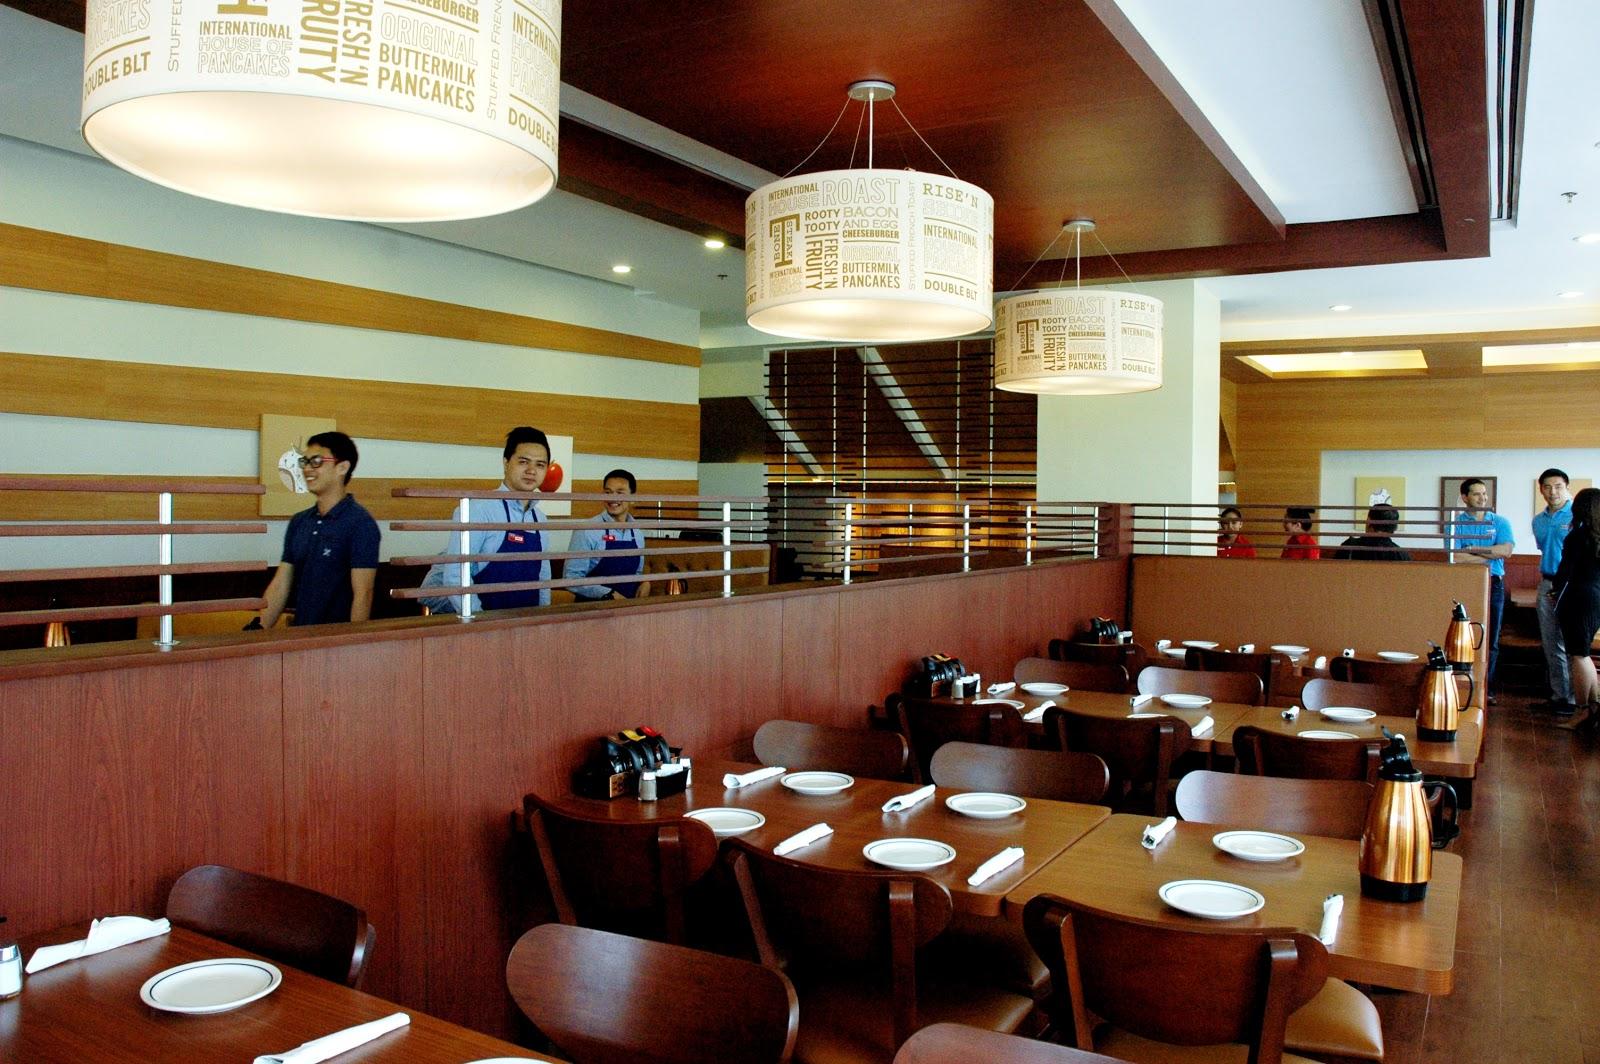 Breakfast Restaurants Fort Walton Beach Fl